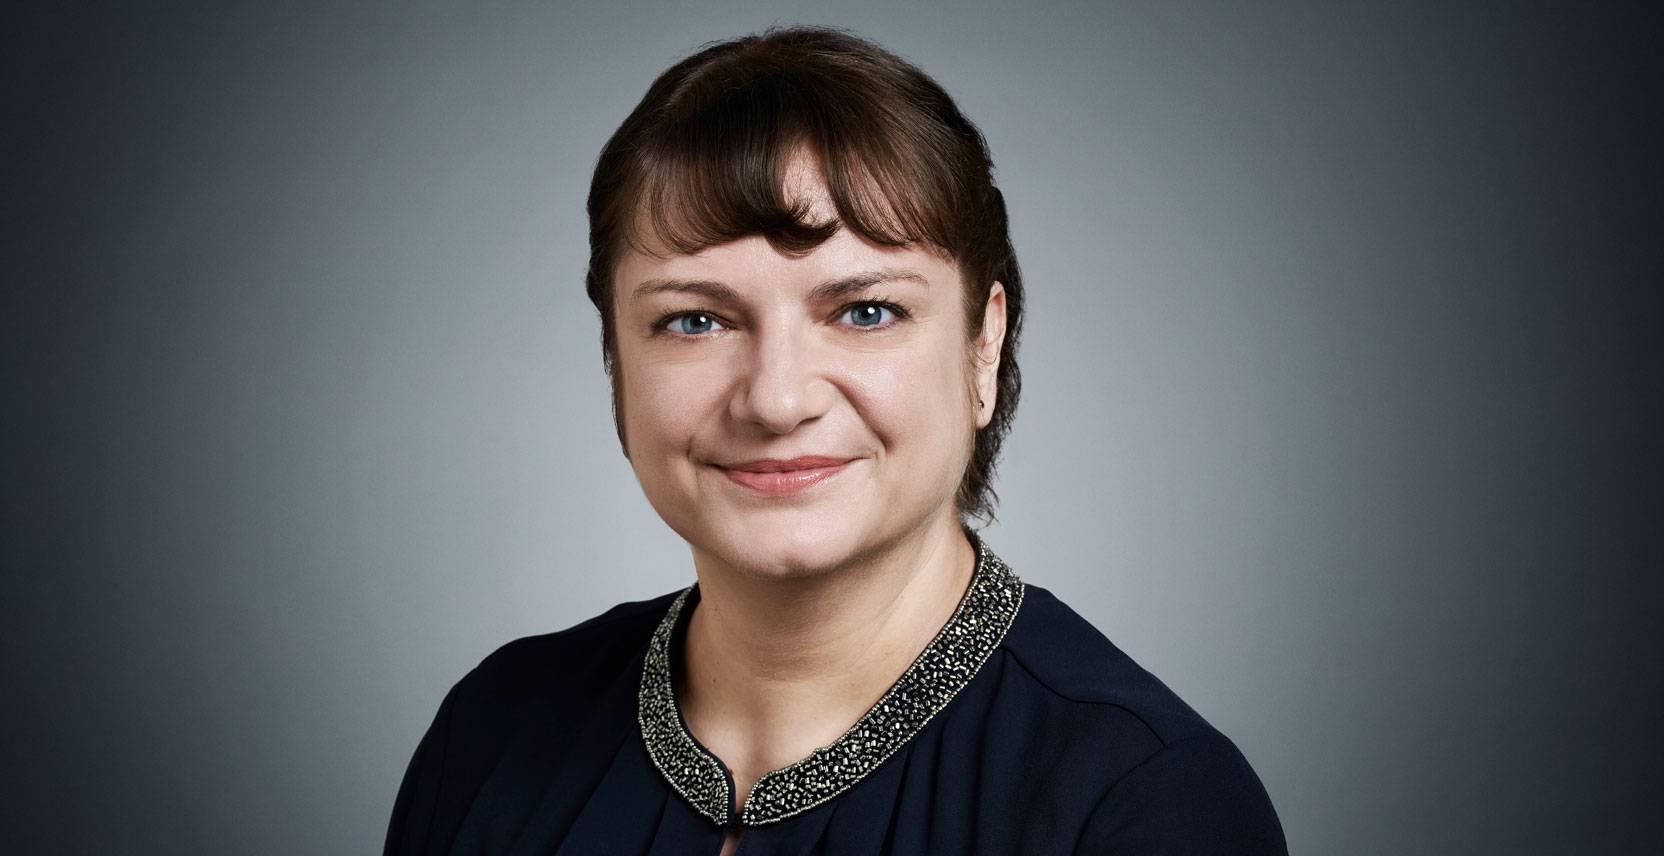 Jana Raths